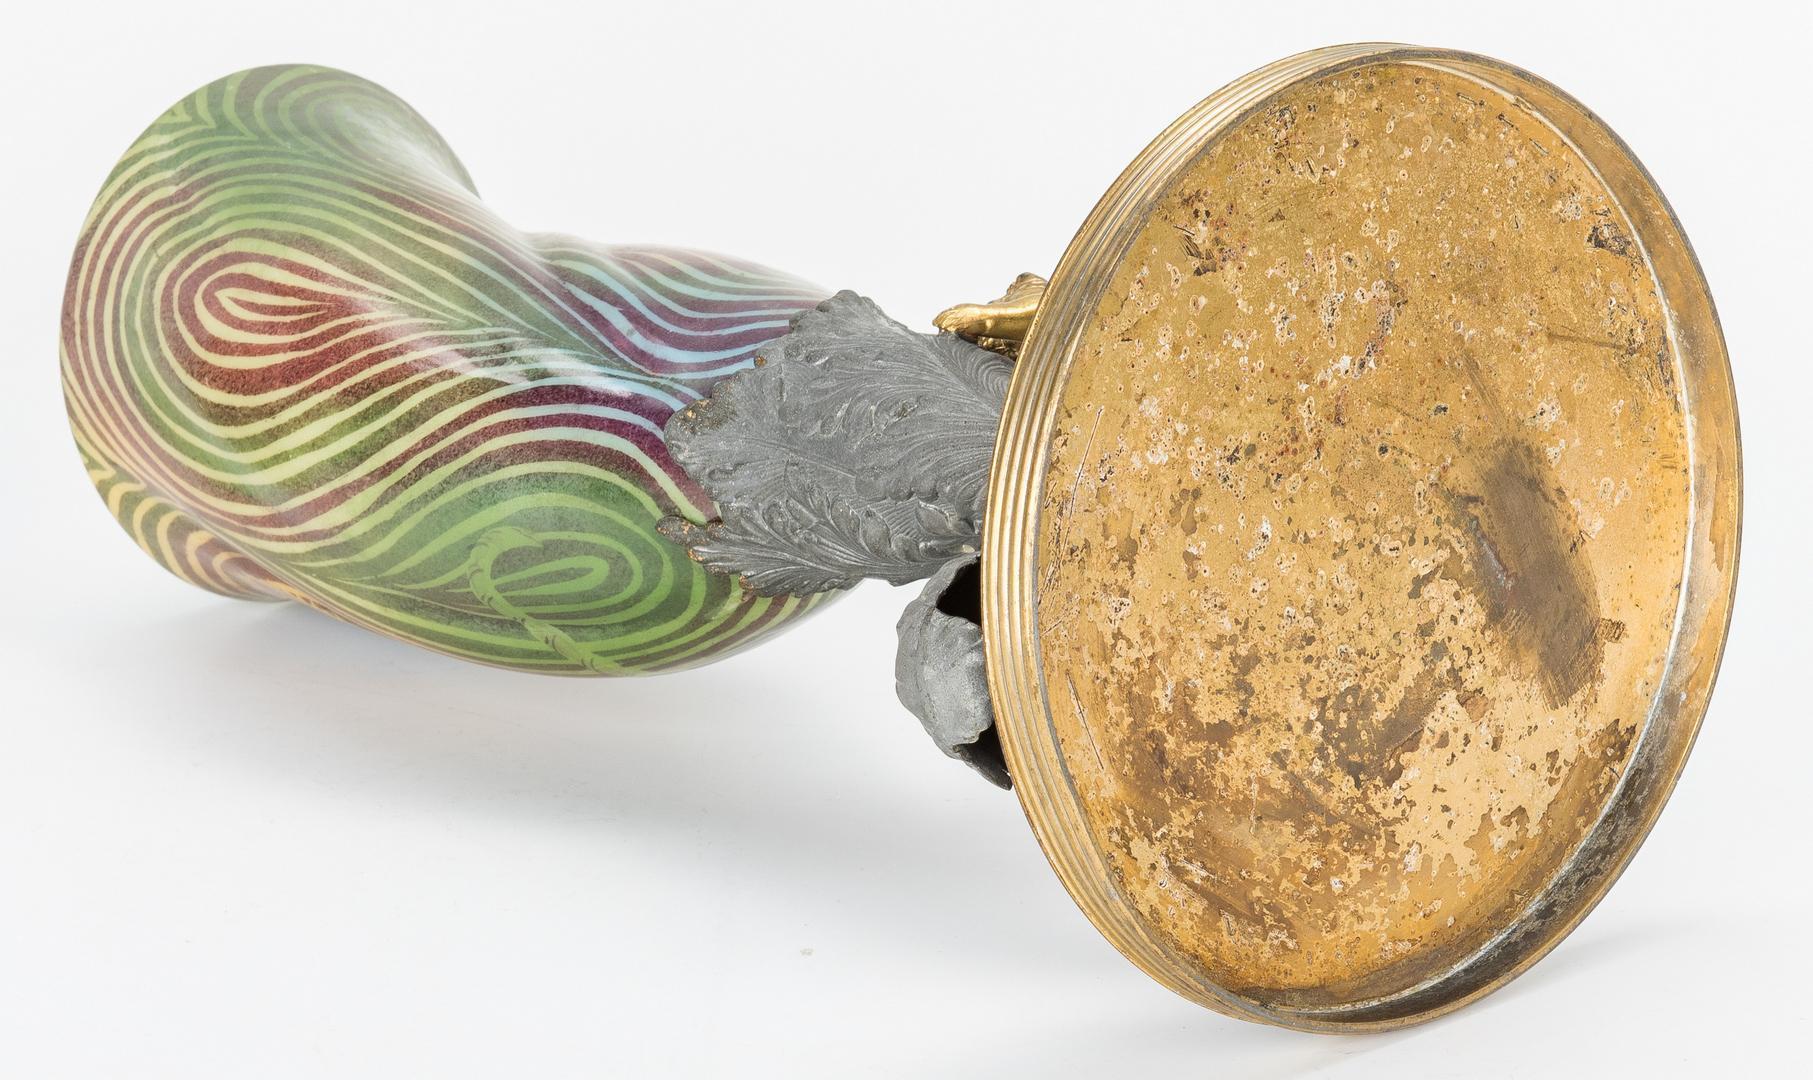 Lot 974 - 3 Decorative Items, incl. Art Nouveau, Arts and Crafts